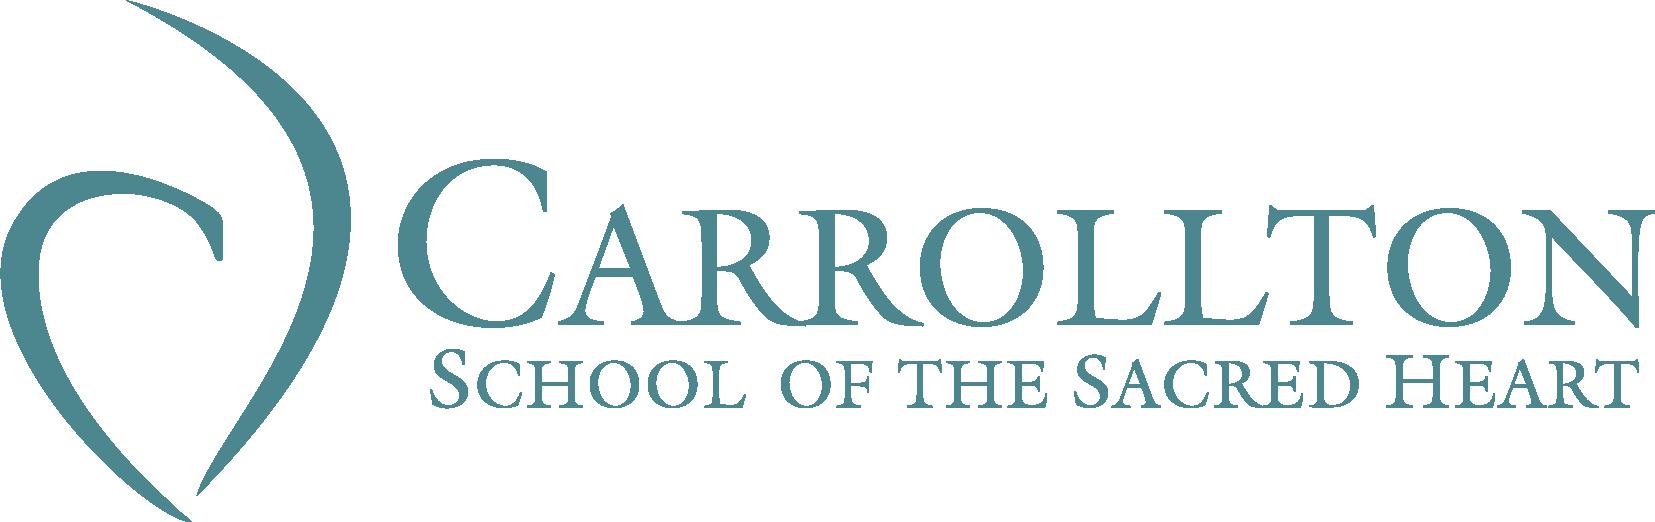 Carrollton School of the Sacred Heart